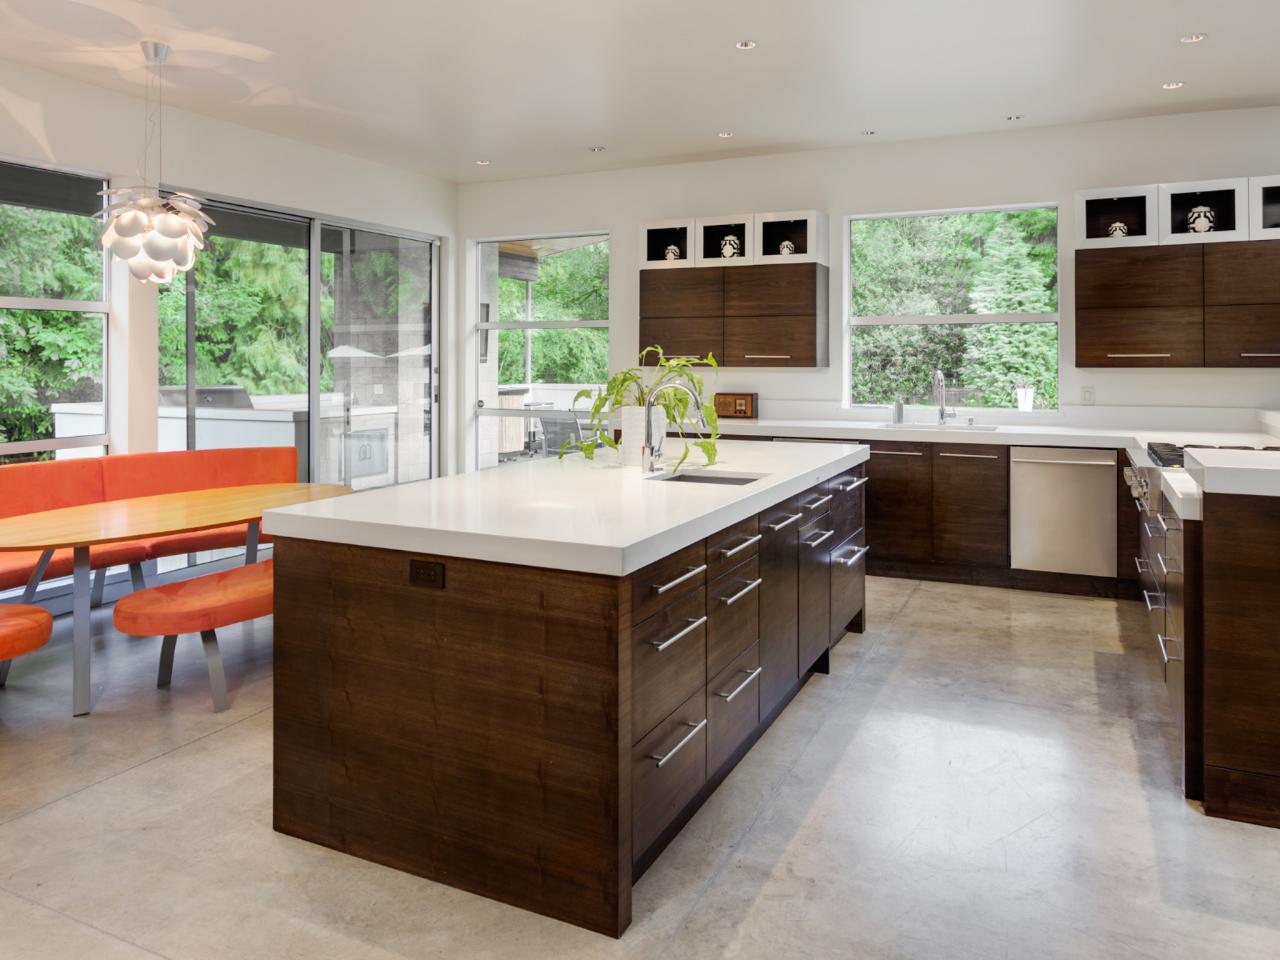 Enhance your kitchen: kitchen flooring options